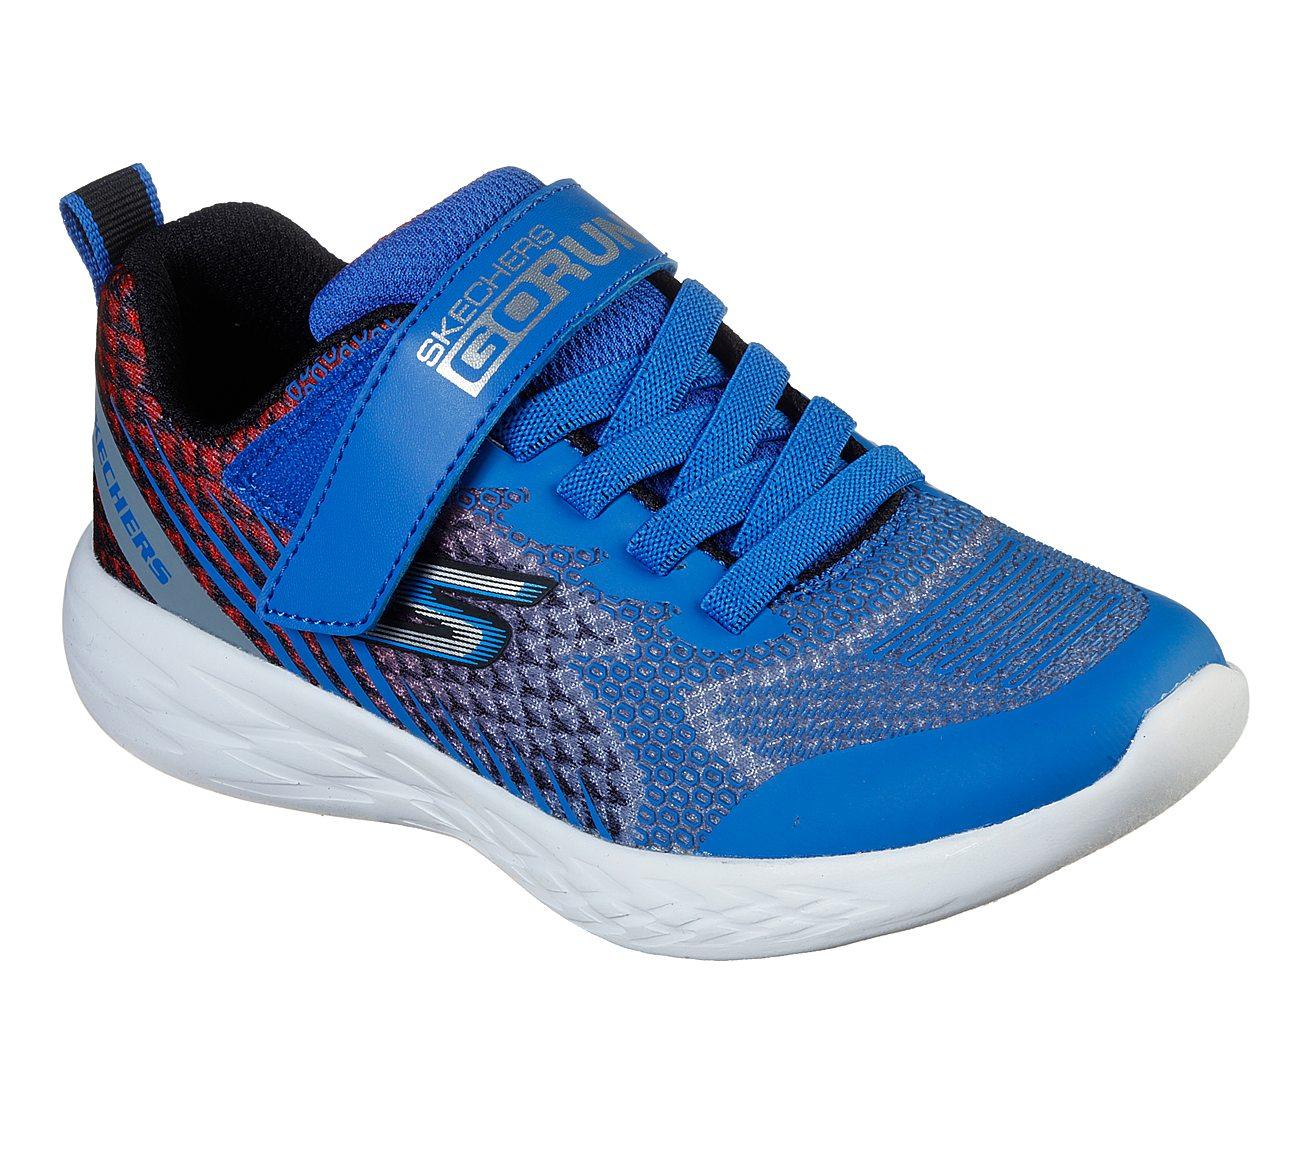 Decimal Desde allí comerciante  Buy SKECHERS Skechers GOrun 600 - Baxtux Skechers Performance Shoes